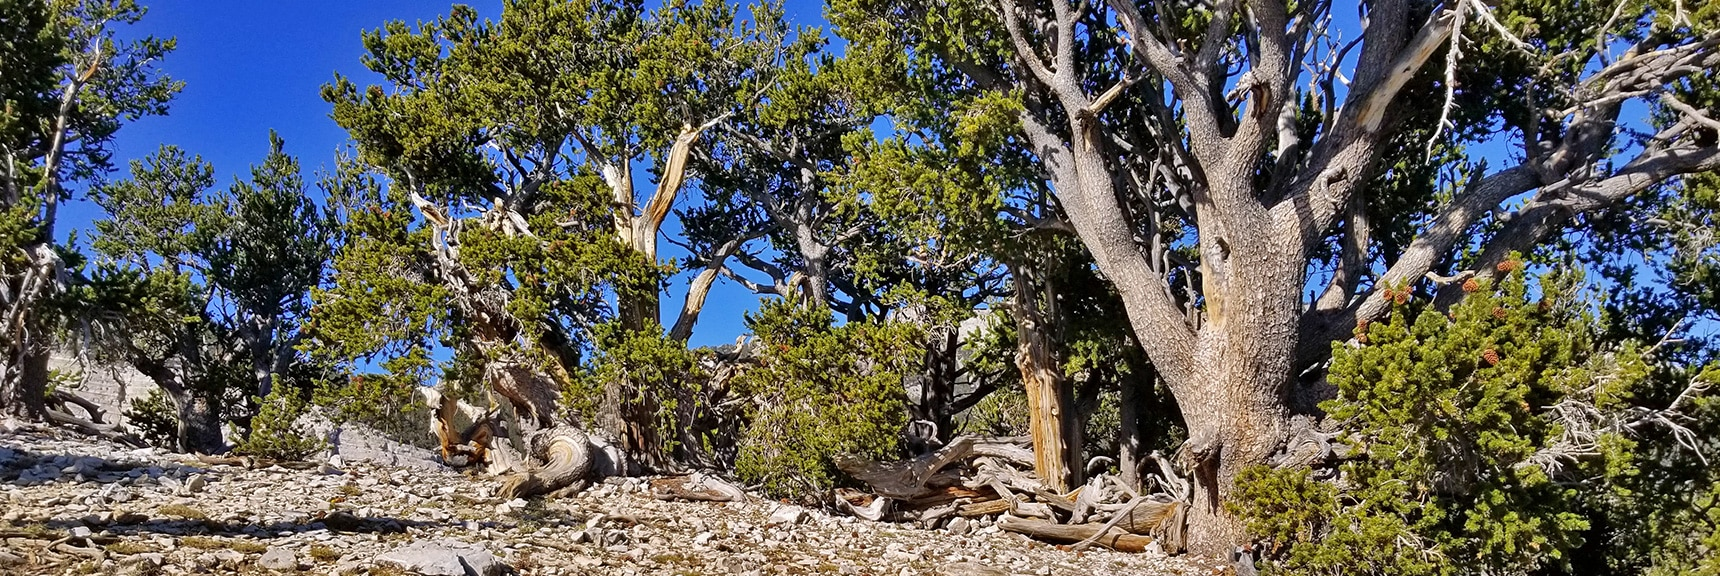 Summit of High Ridge on North Loop Trail | Mummy Springs Loop | Mt. Charleston Wilderness | Spring Mountains, Nevada